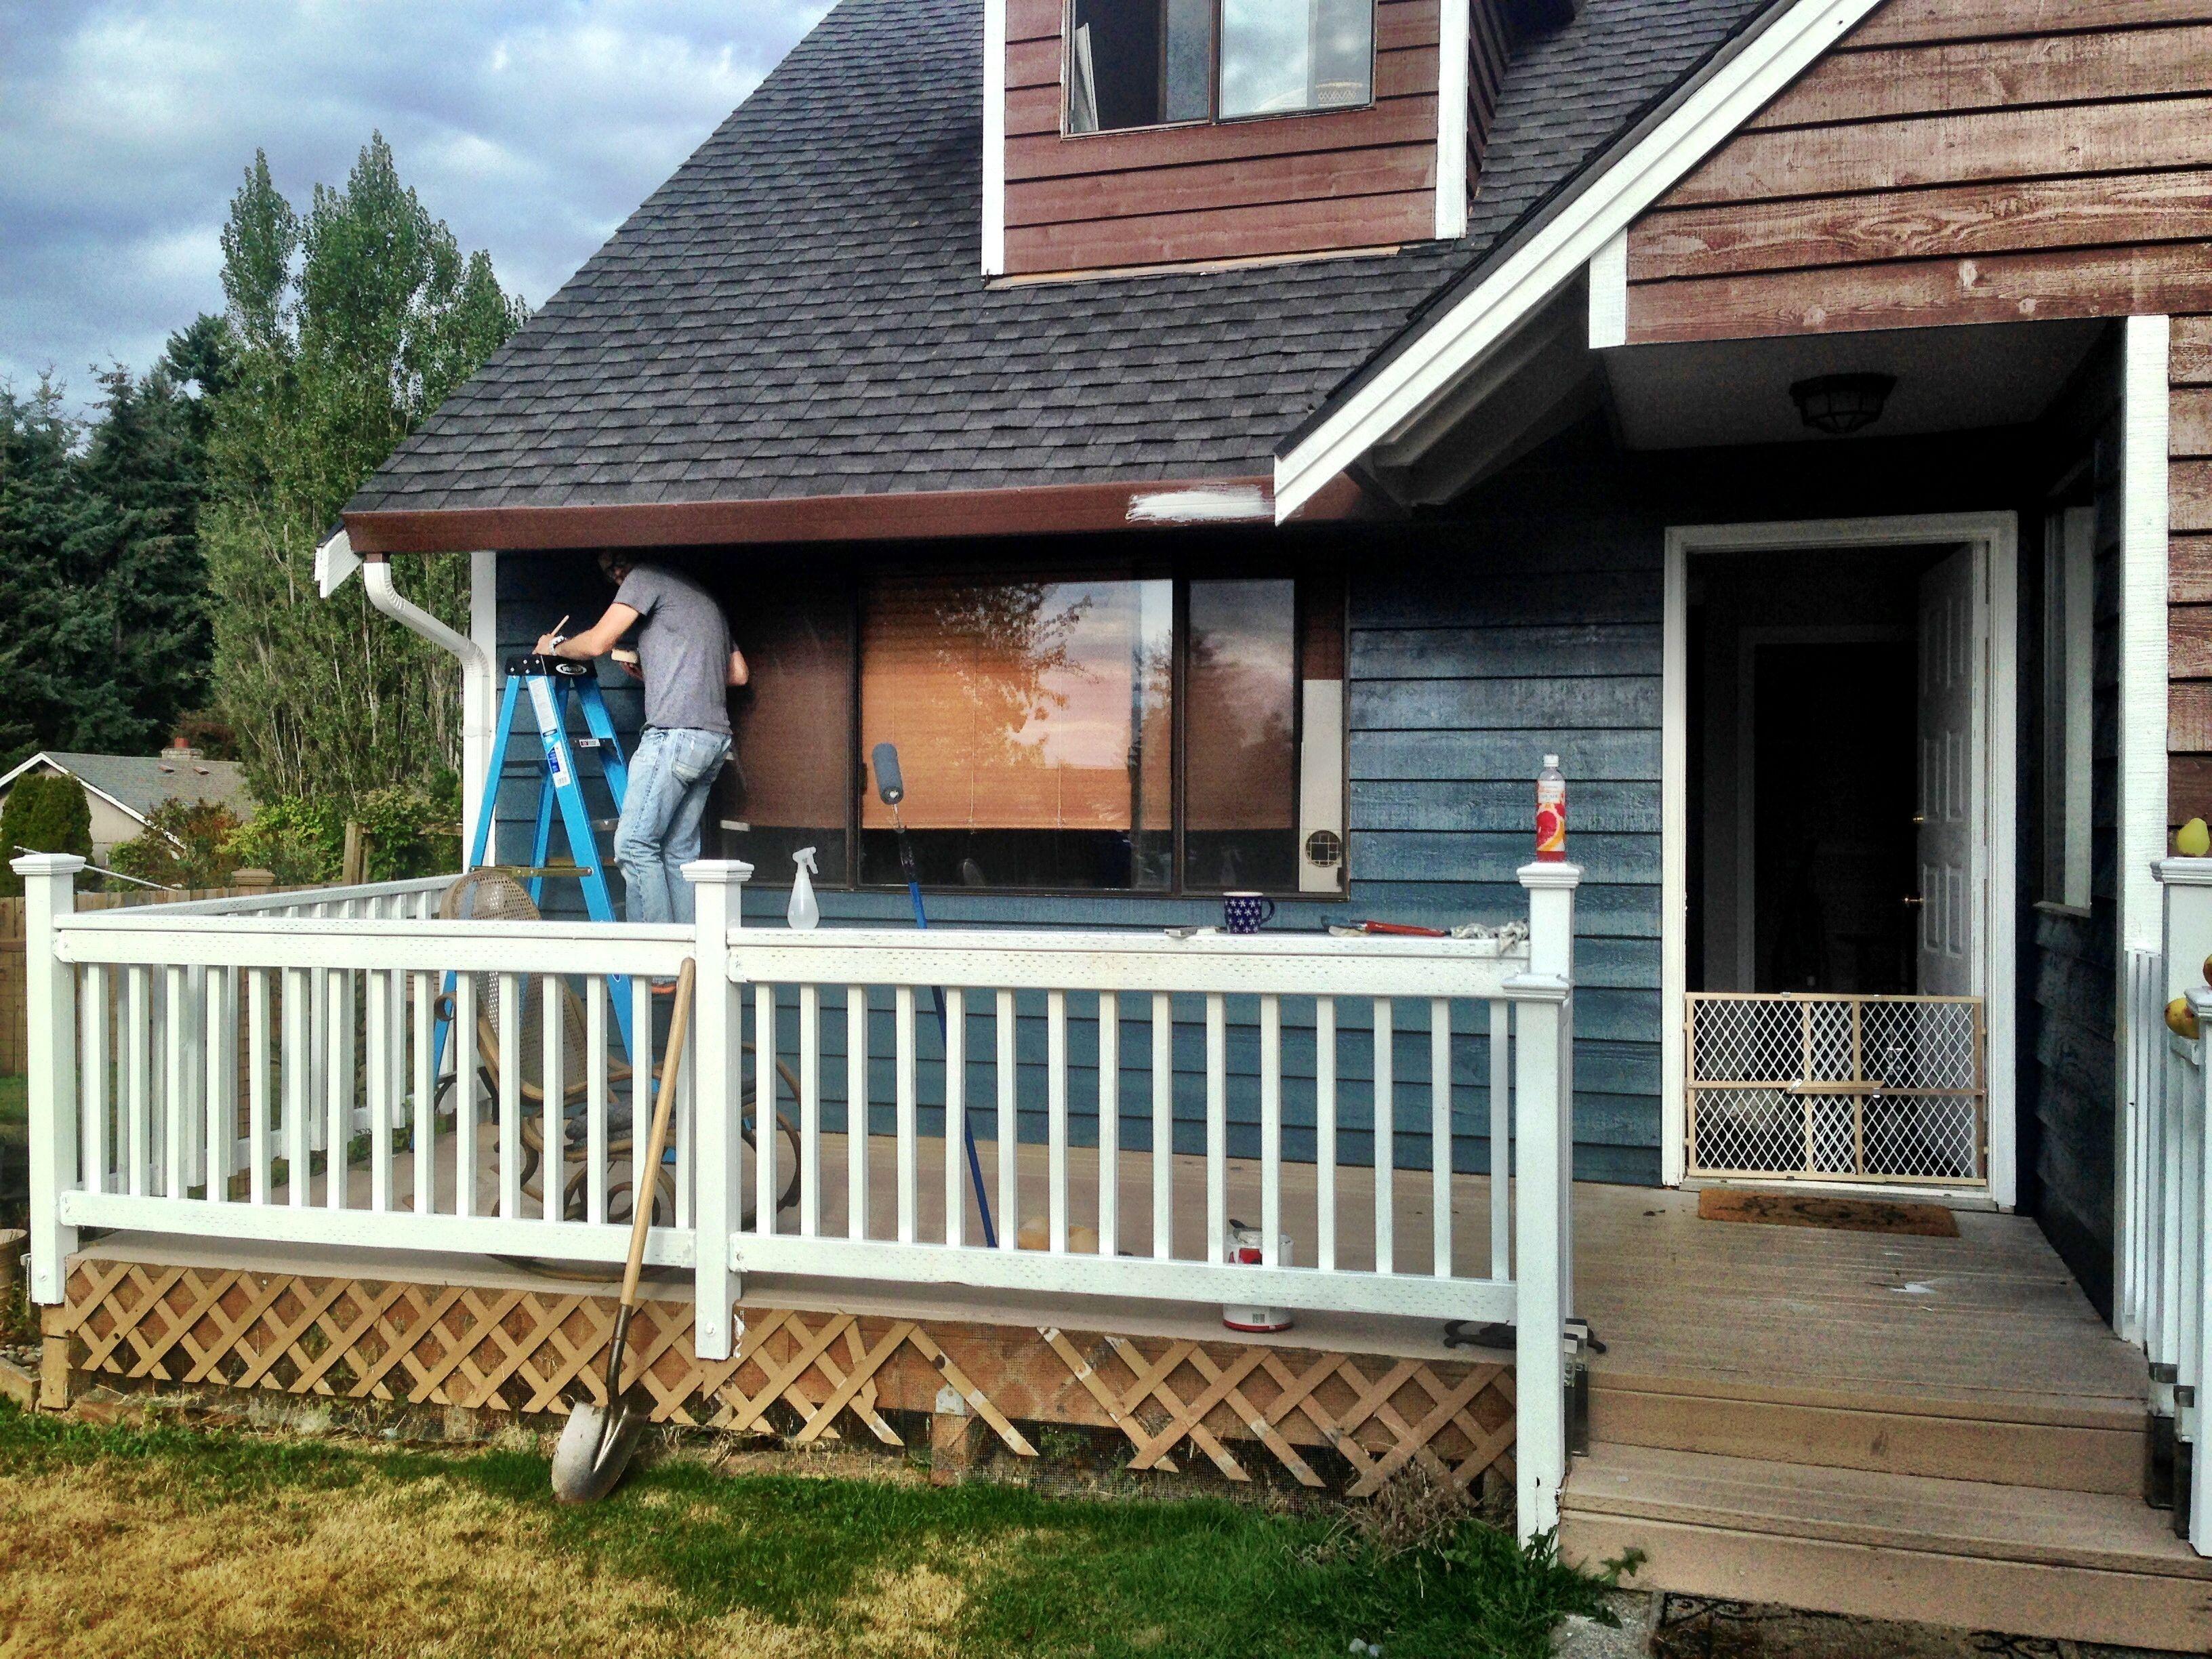 14 Mindblowing Inspirational Front Porch No Roof Si05zu Https Sanantoniohomeinspector Biz 14 Min Front Porch Without Roof Front Porch Deck Front Porch Design